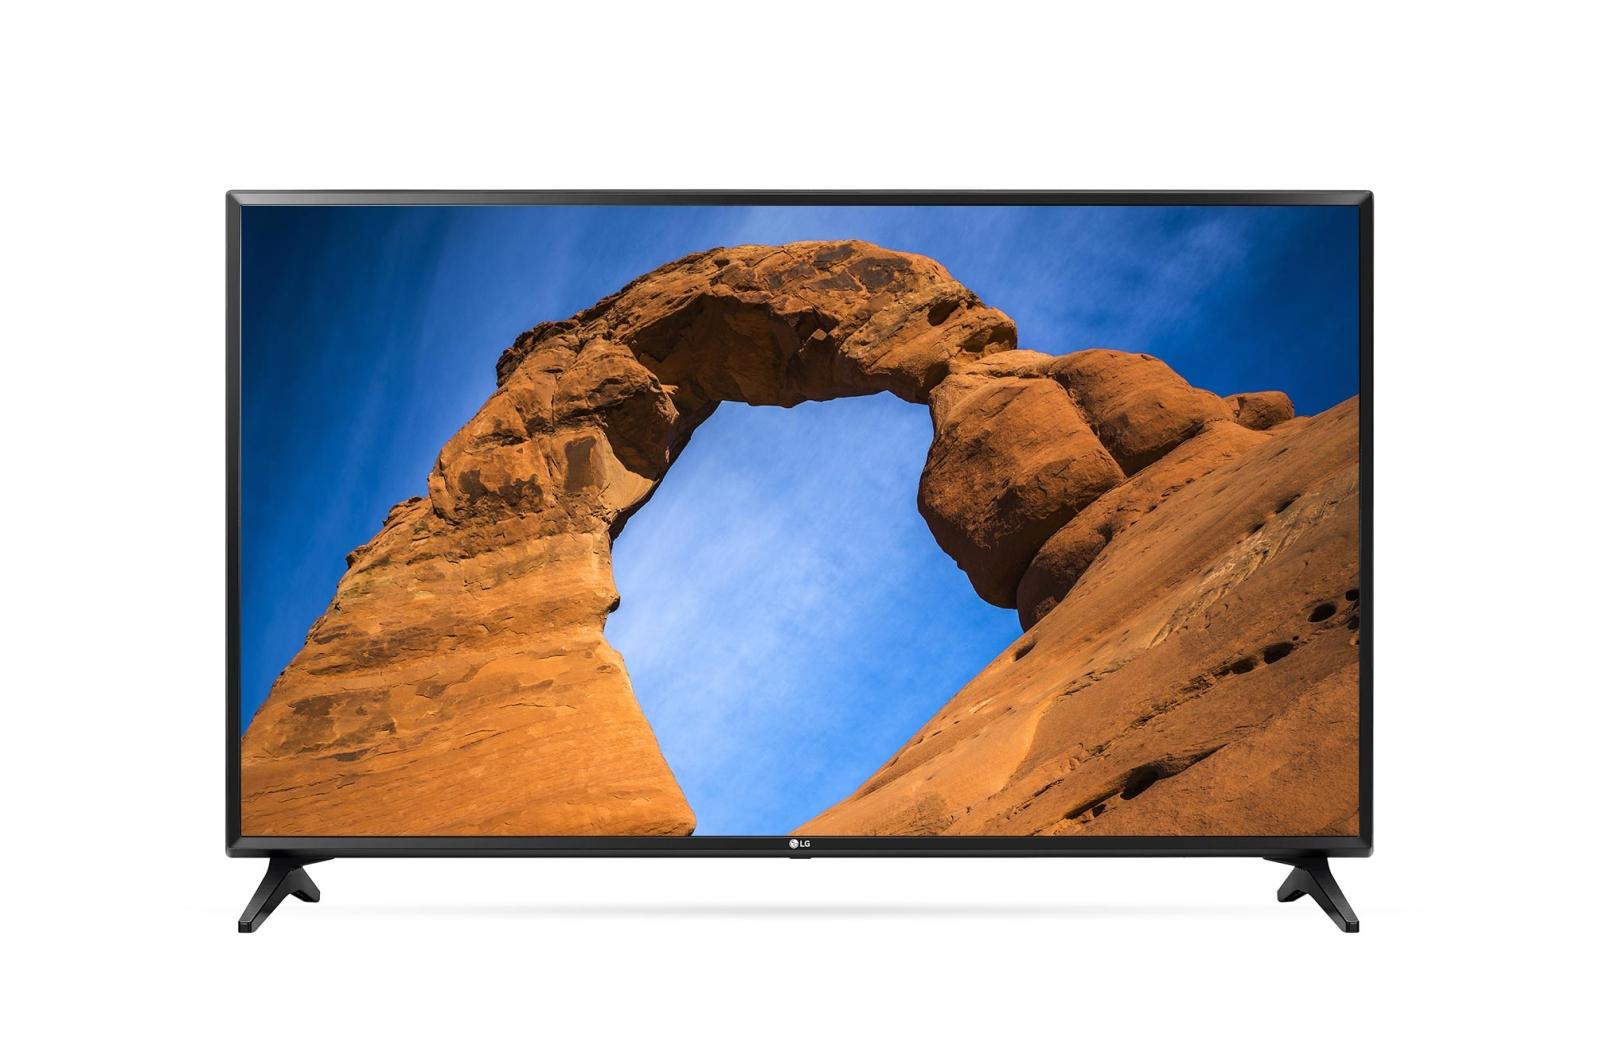 LG 49LK5900PLA TV 124.5 cm (49